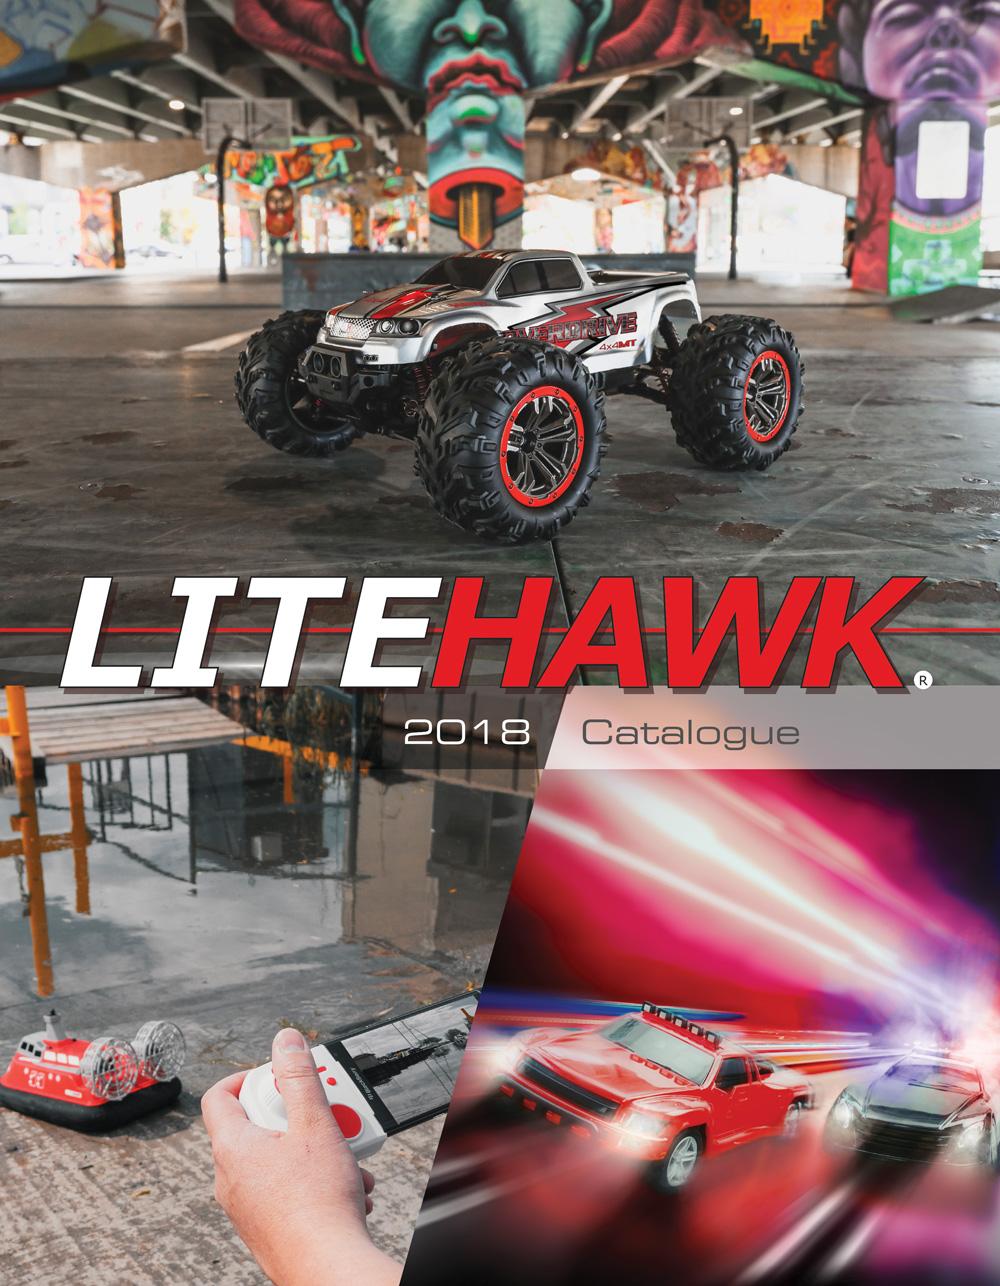 LiteHawk-2018-Brochure-Cover-Web.jpg